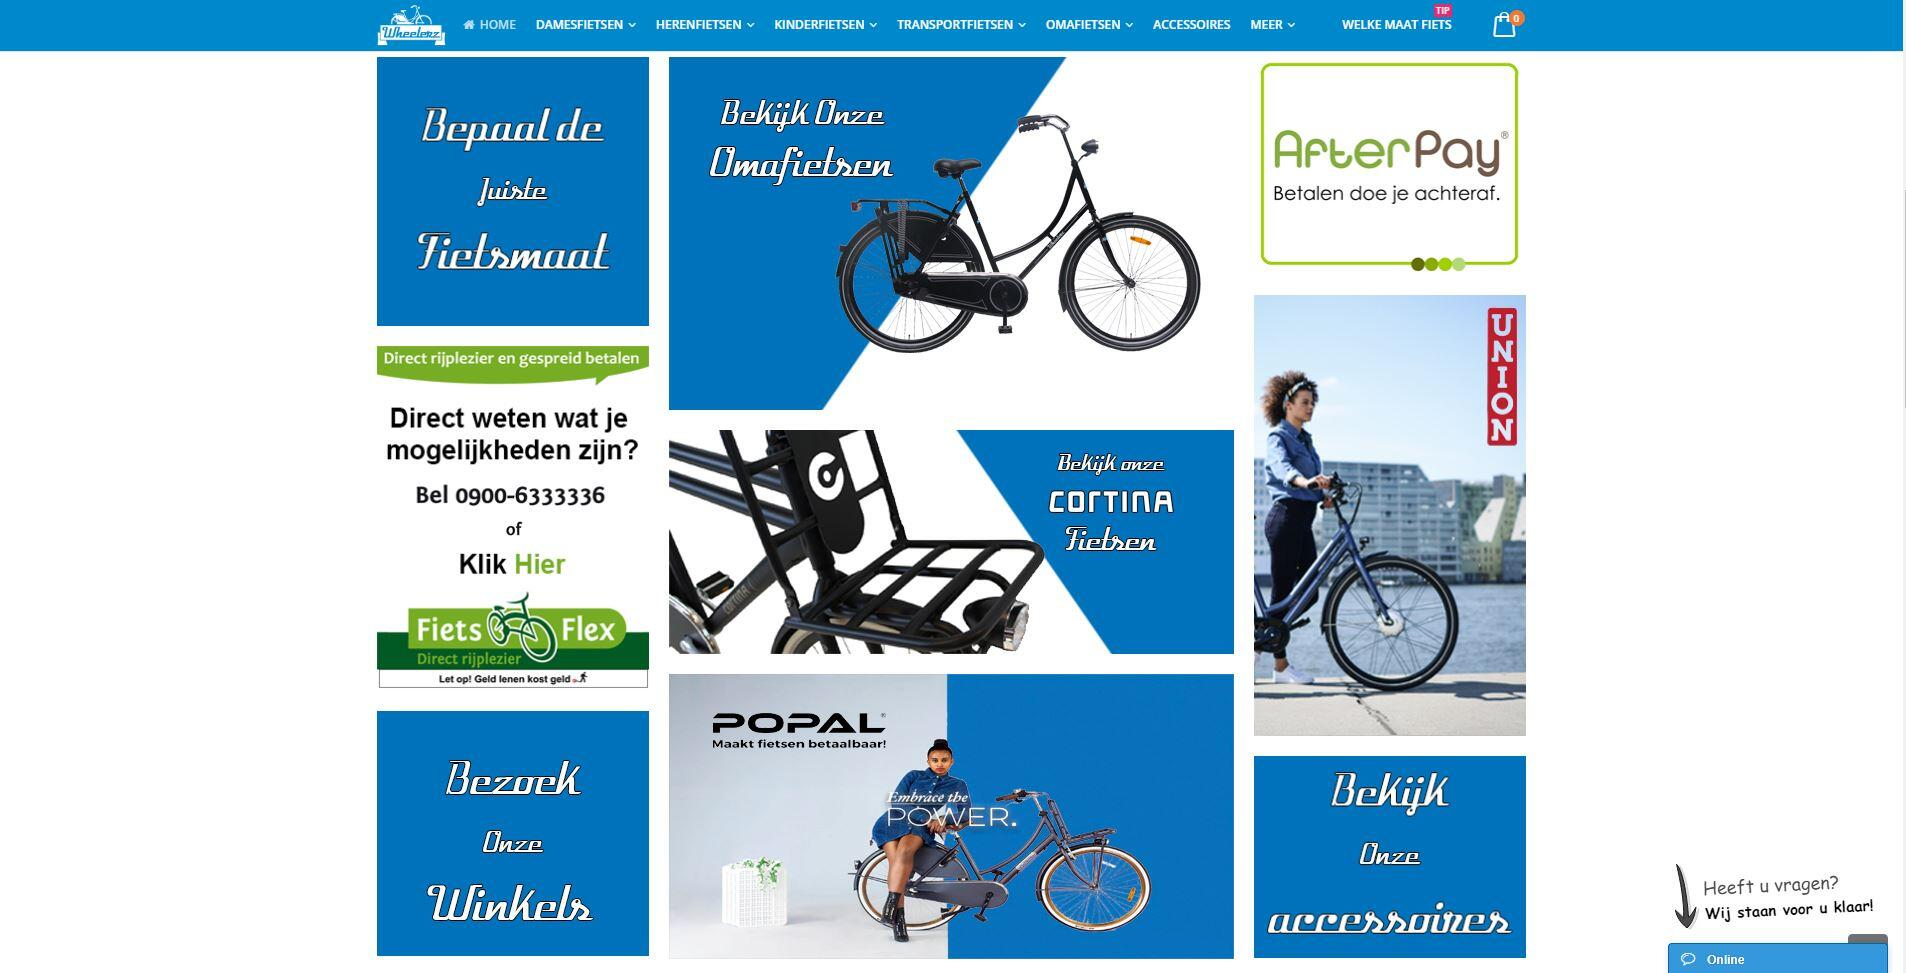 Wheelerz fietsen webshop Amsterdam